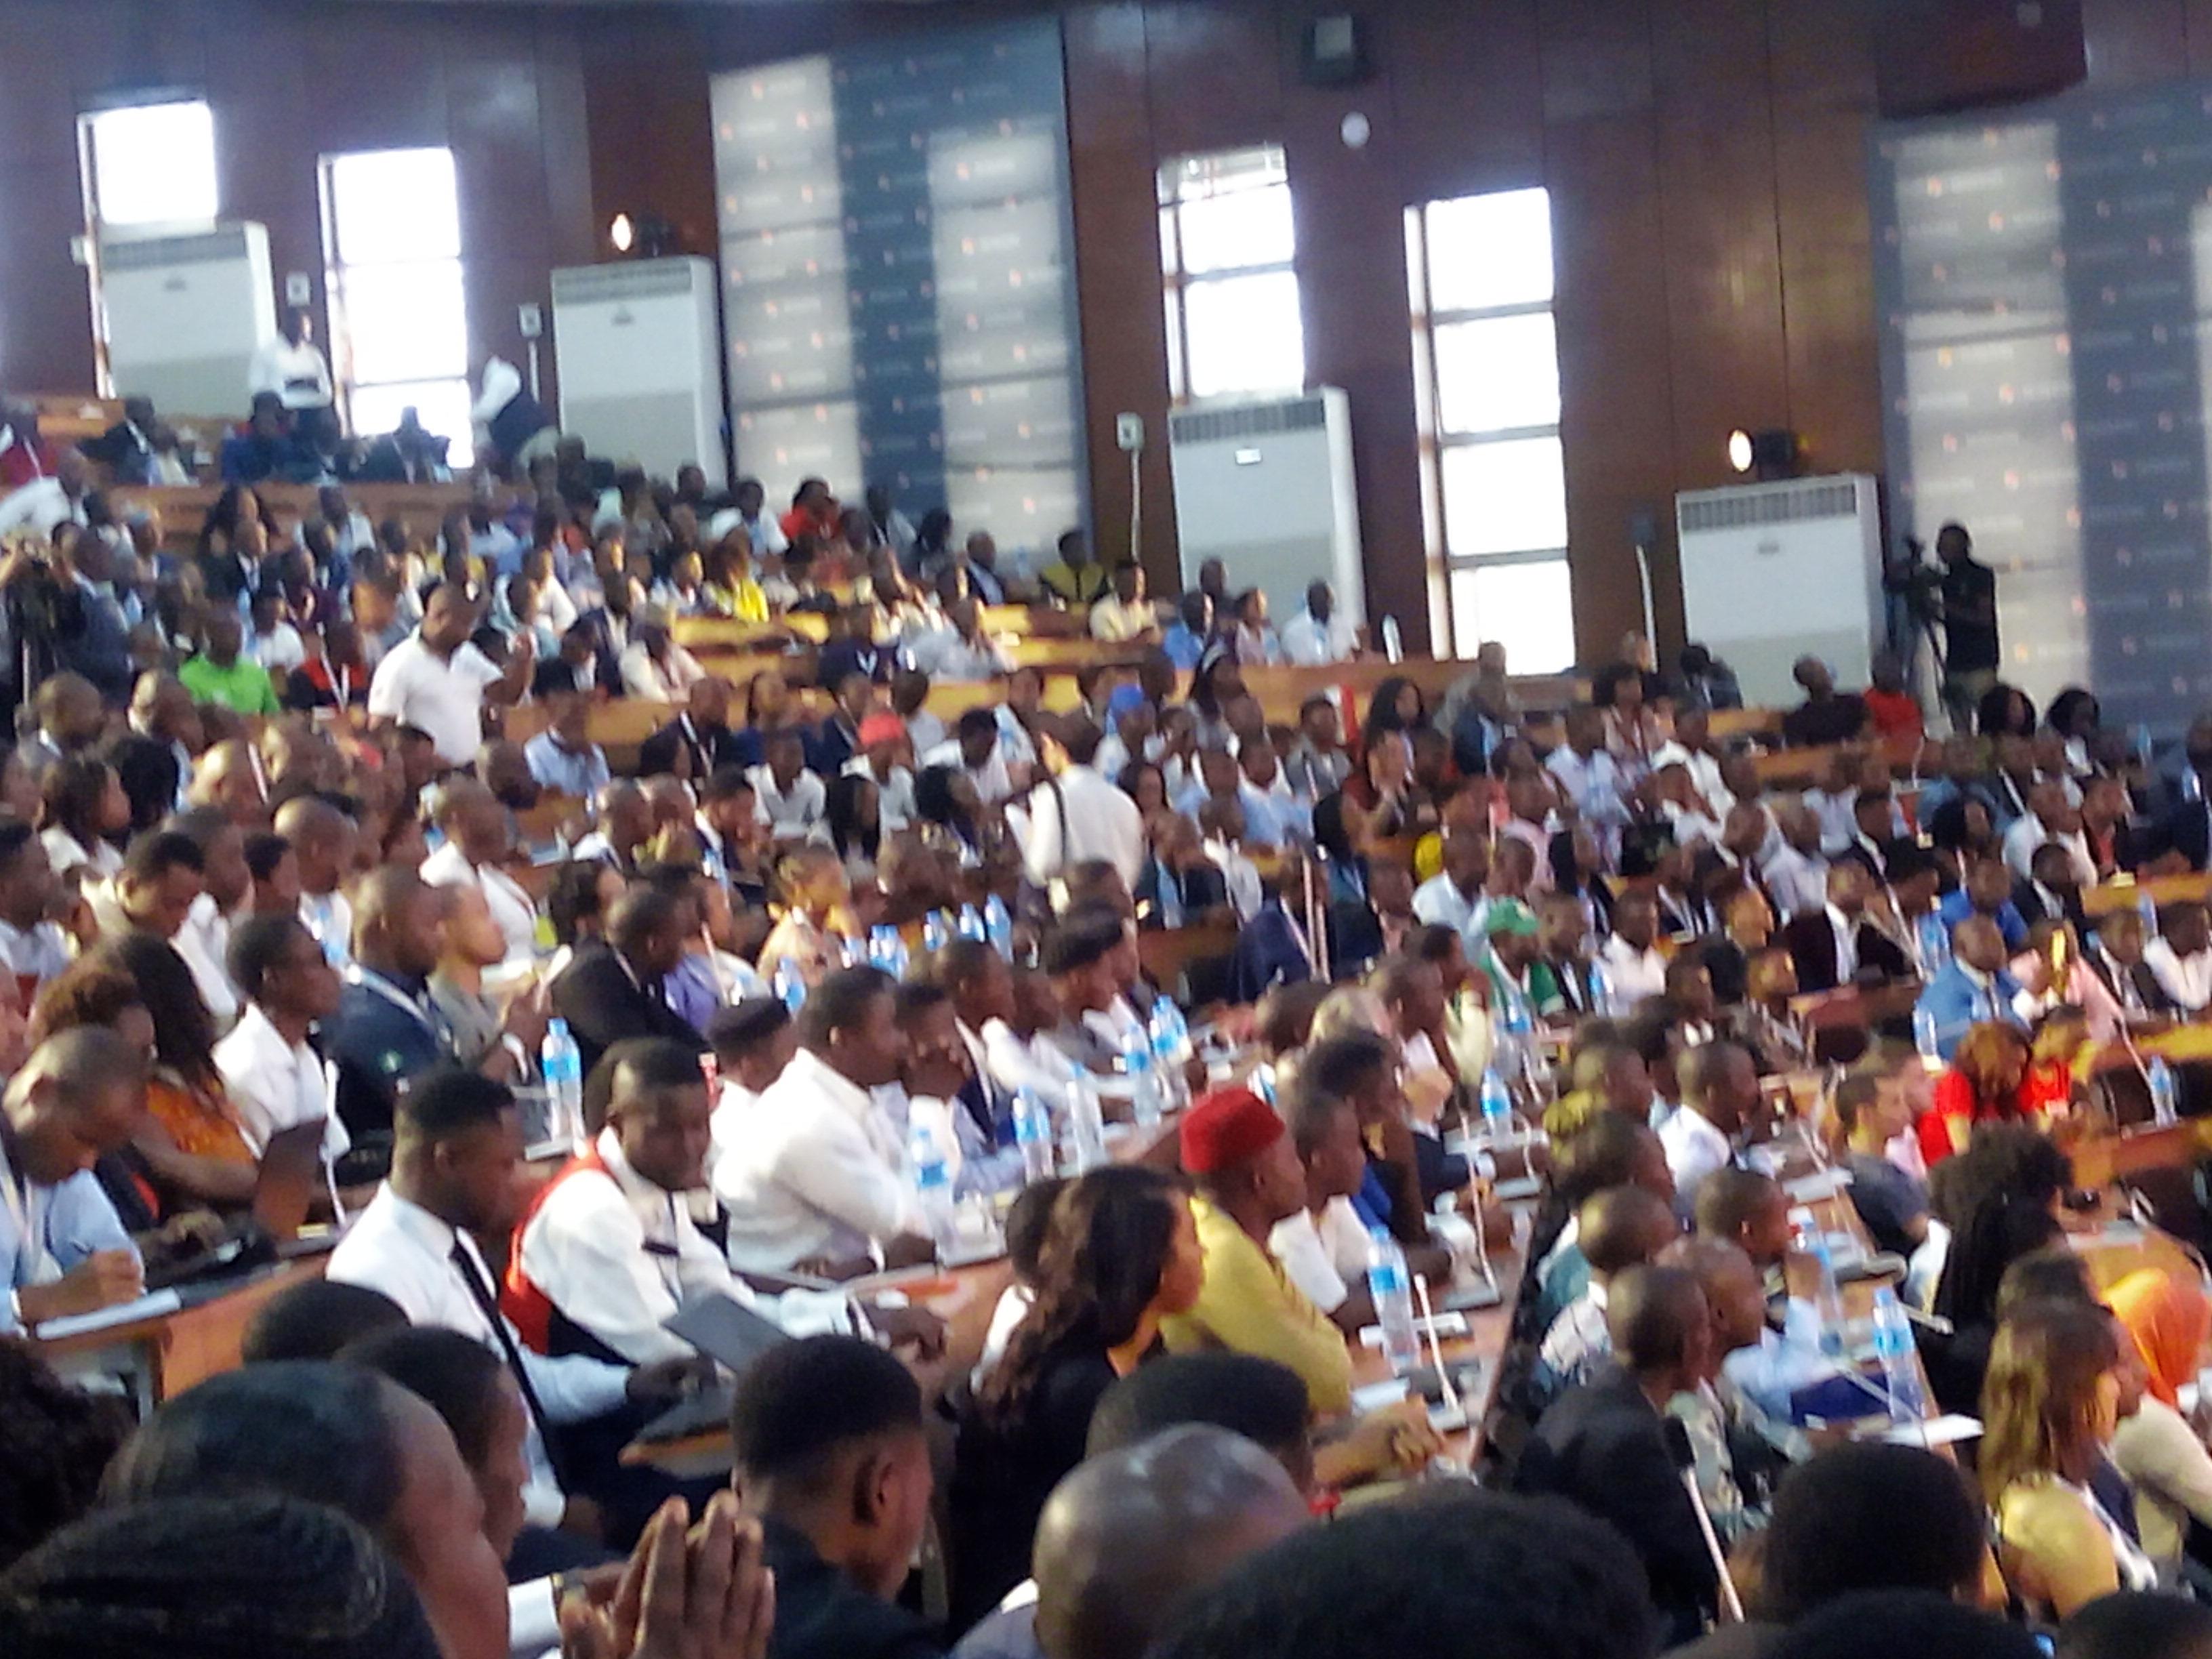 7-tony-elumelu-entrepreneurship-forum-2016